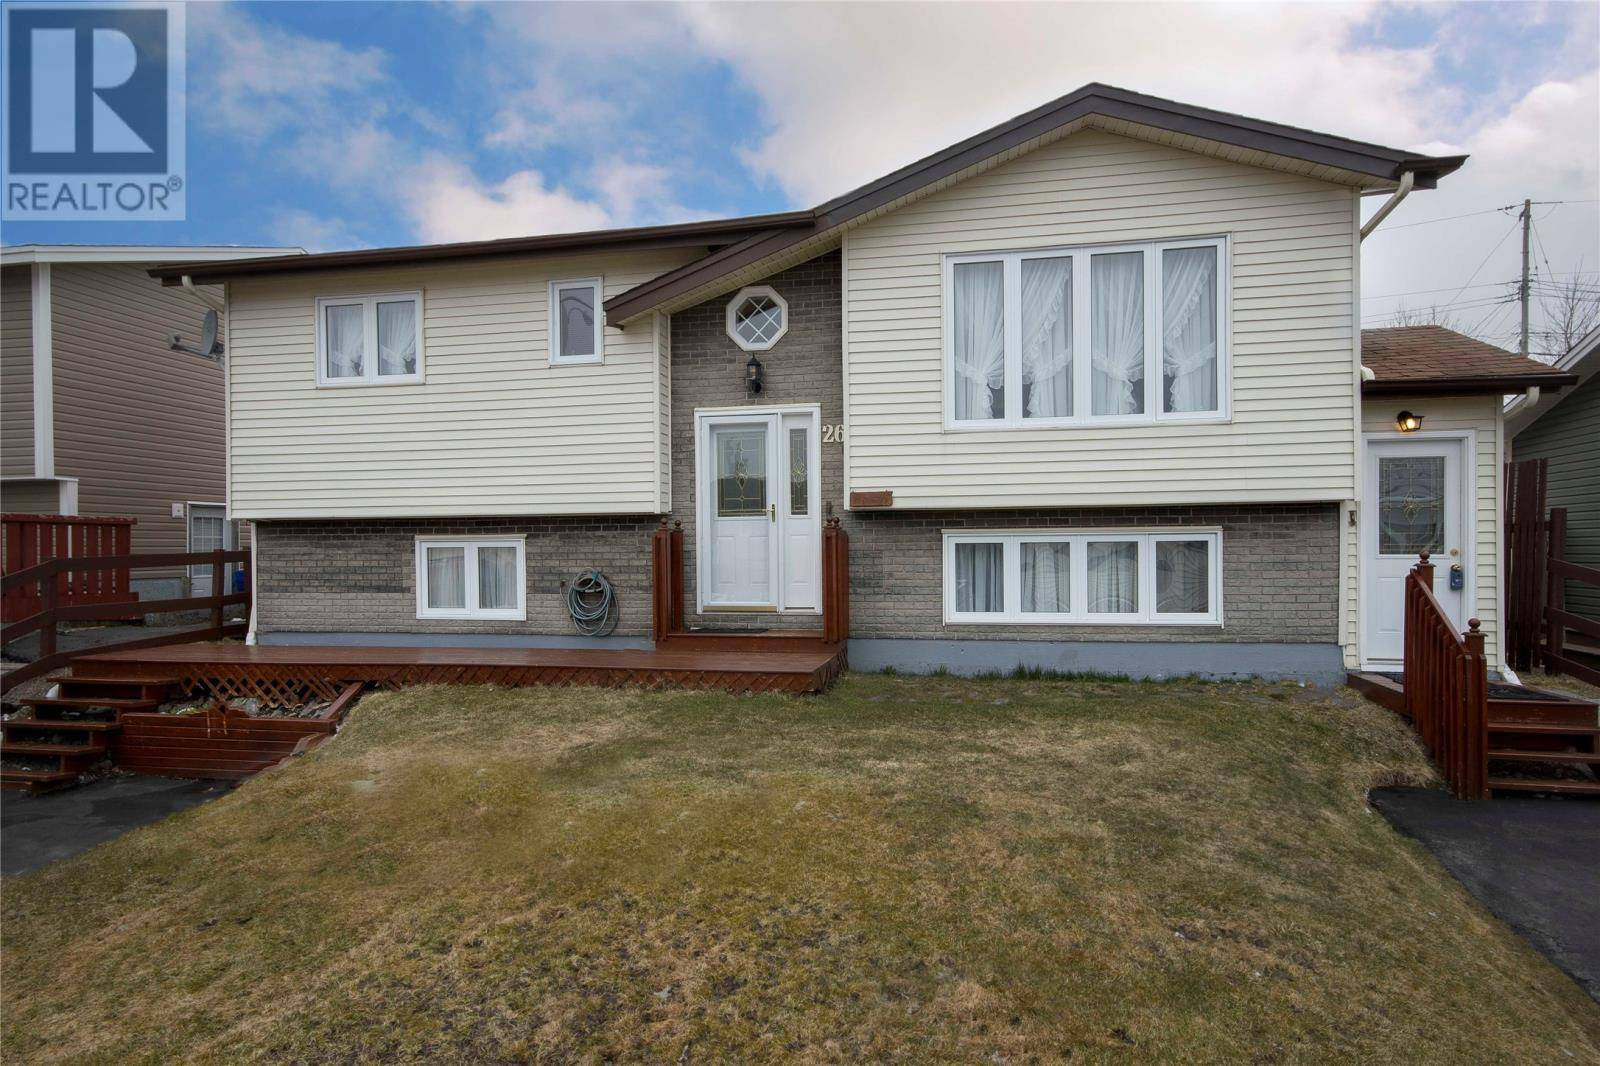 House for sale at 26 Soper Cres St. John's Newfoundland - MLS: 1209189